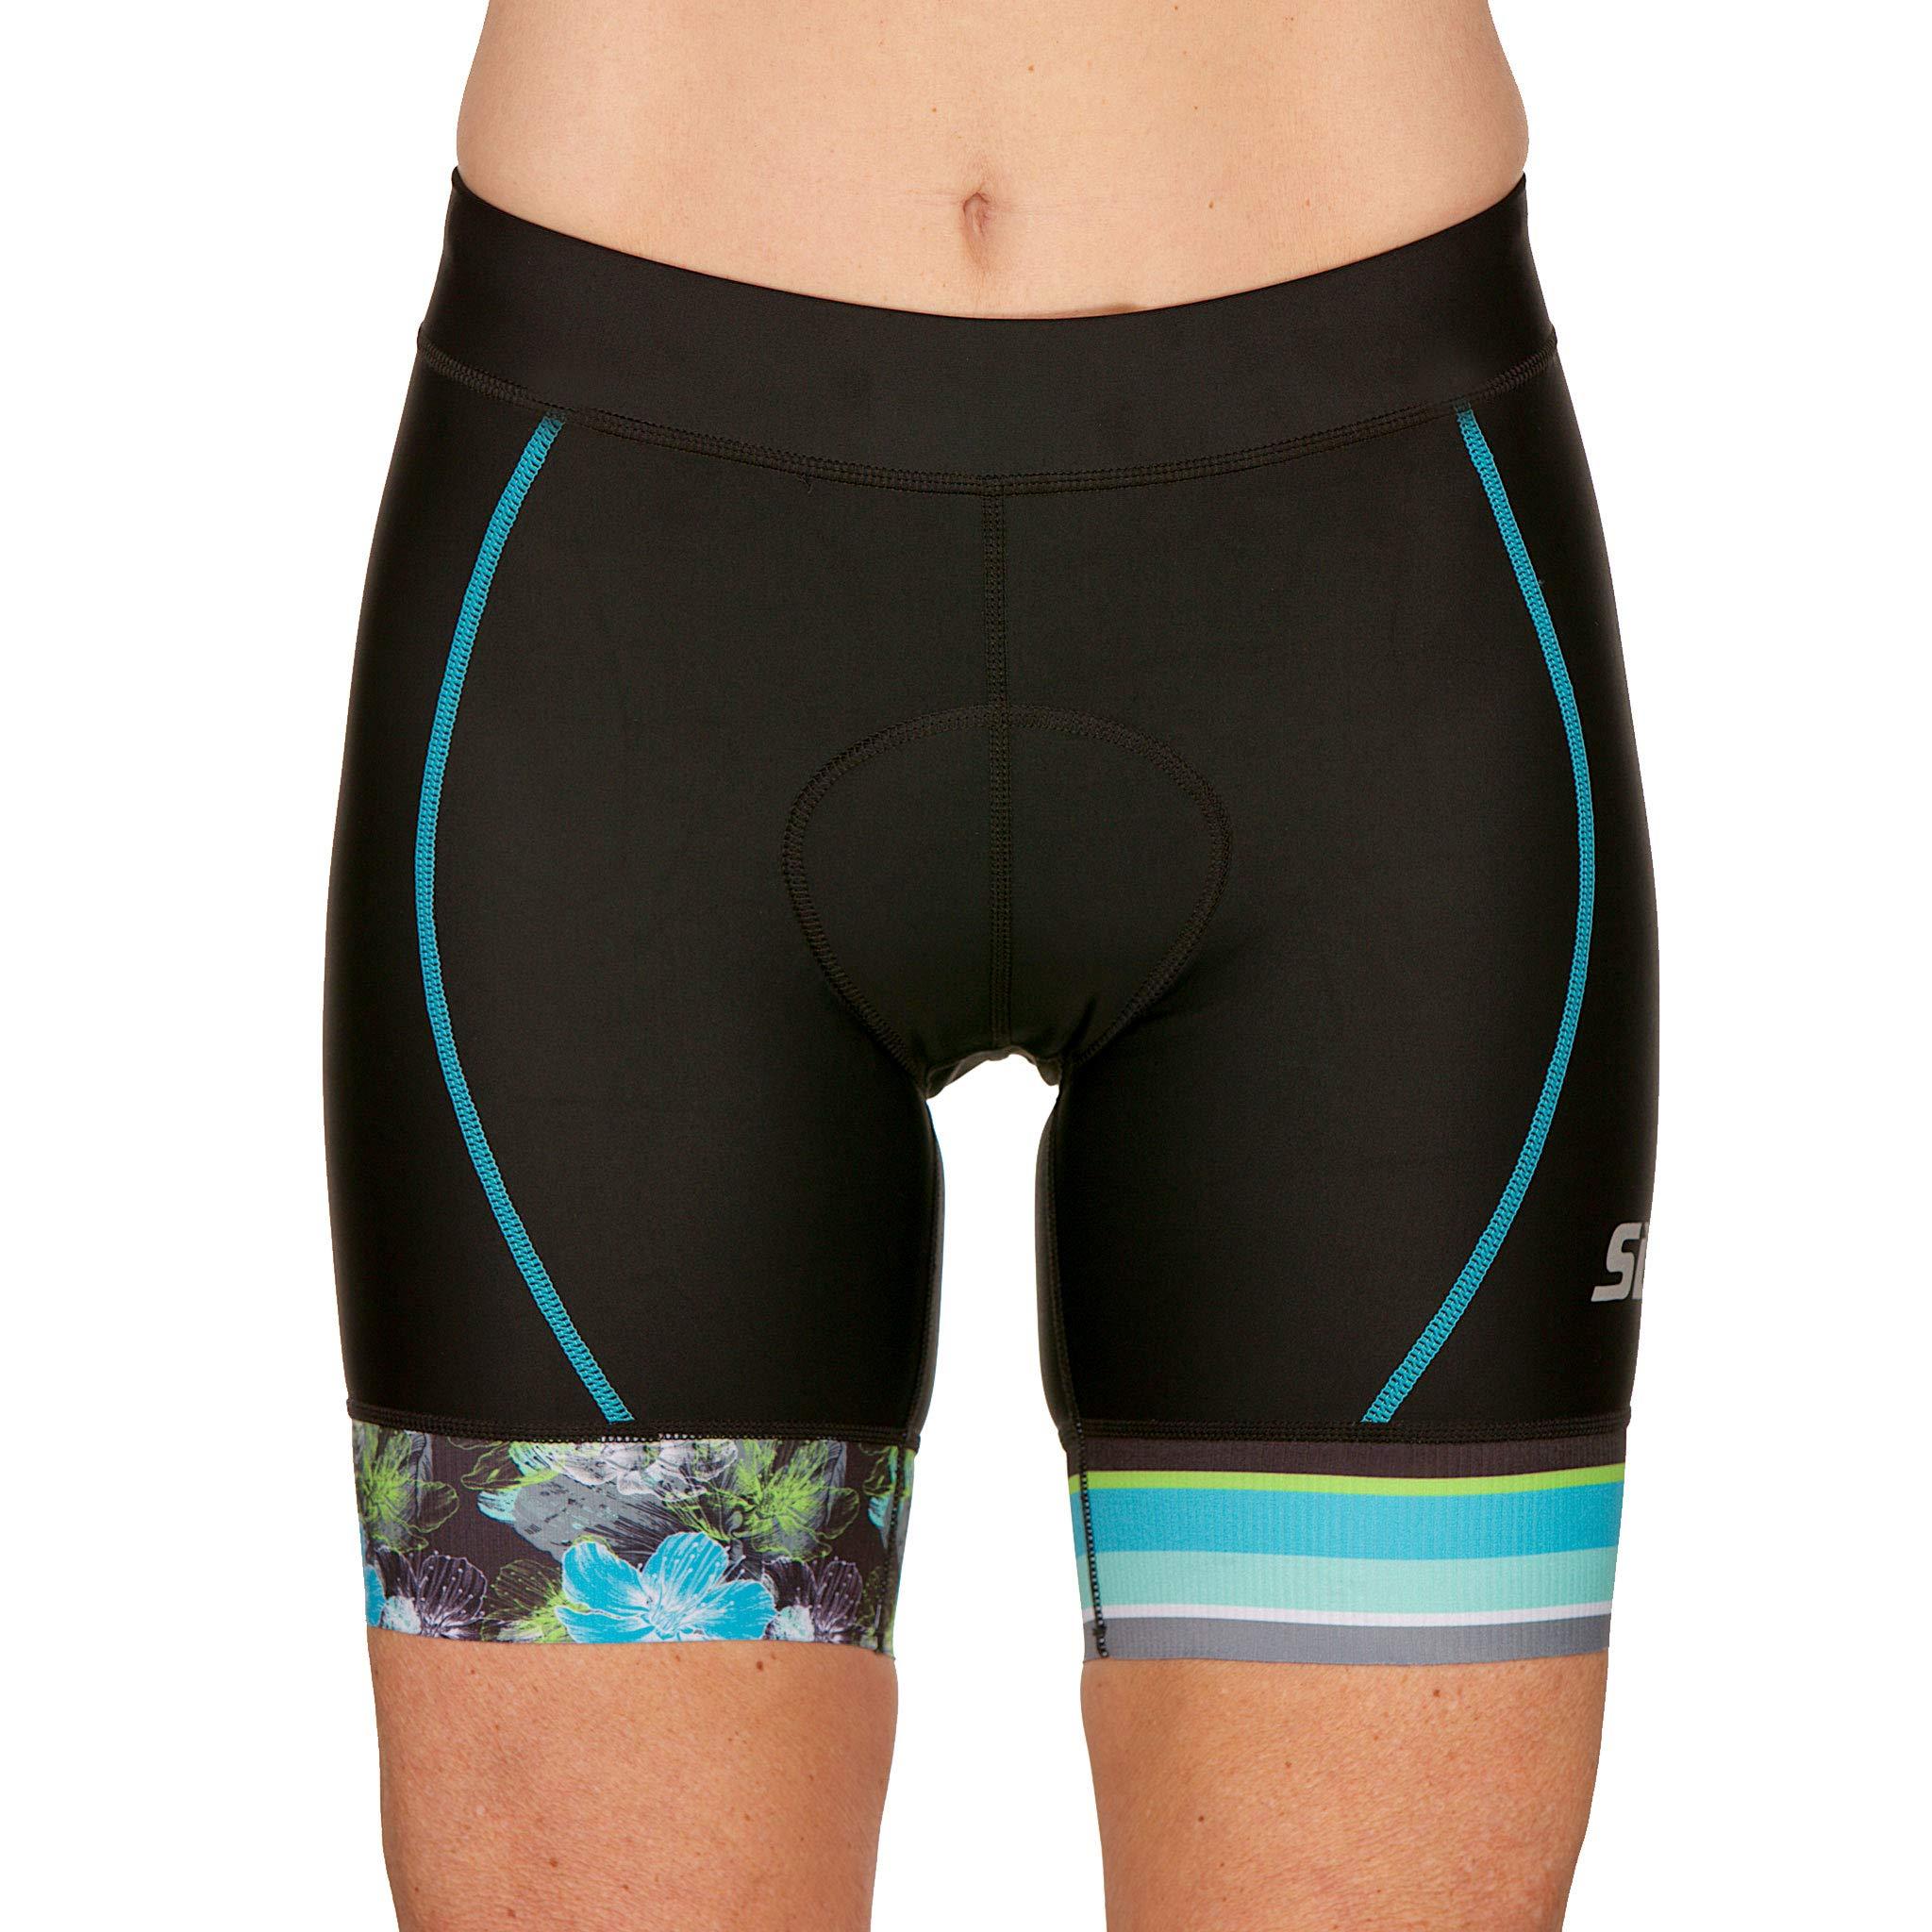 SLS3 Women's Triathlon Shorts | 6 inch FX Tri Short for Women Black | Super Comfy with Soft Chamois | German Designed (Black/Martinica Blue, XS)